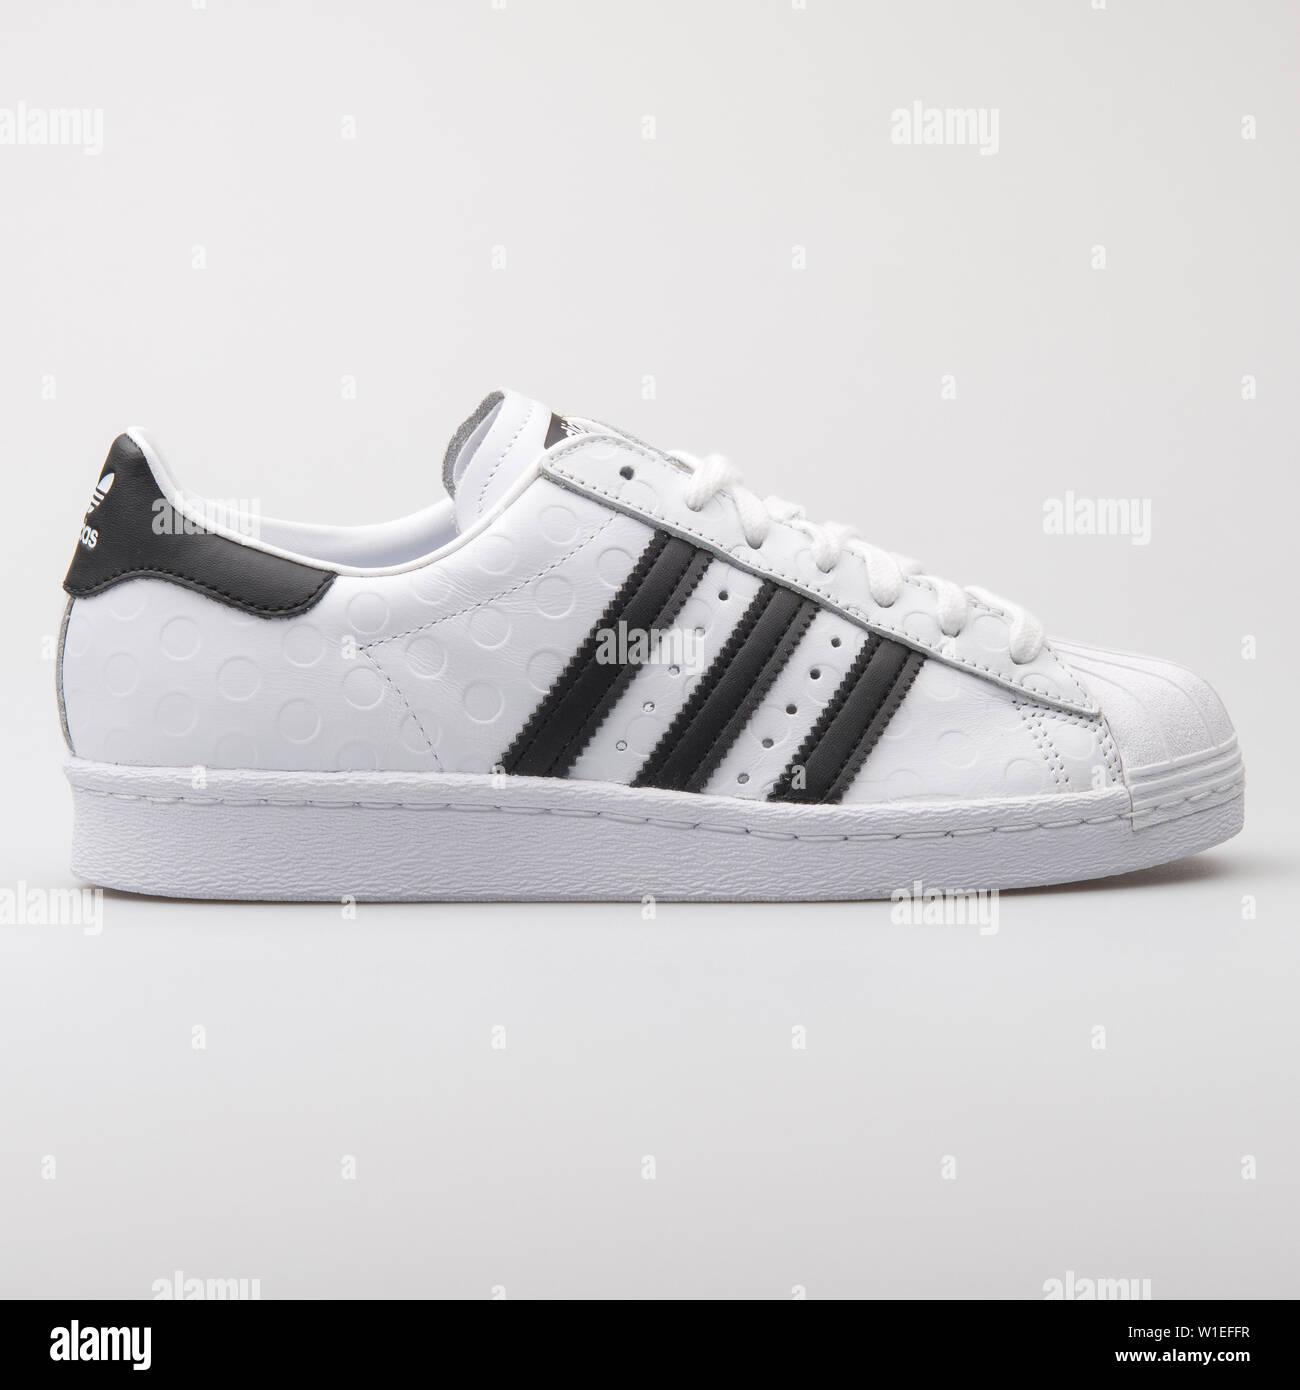 Adidas Superstar High Resolution Stock